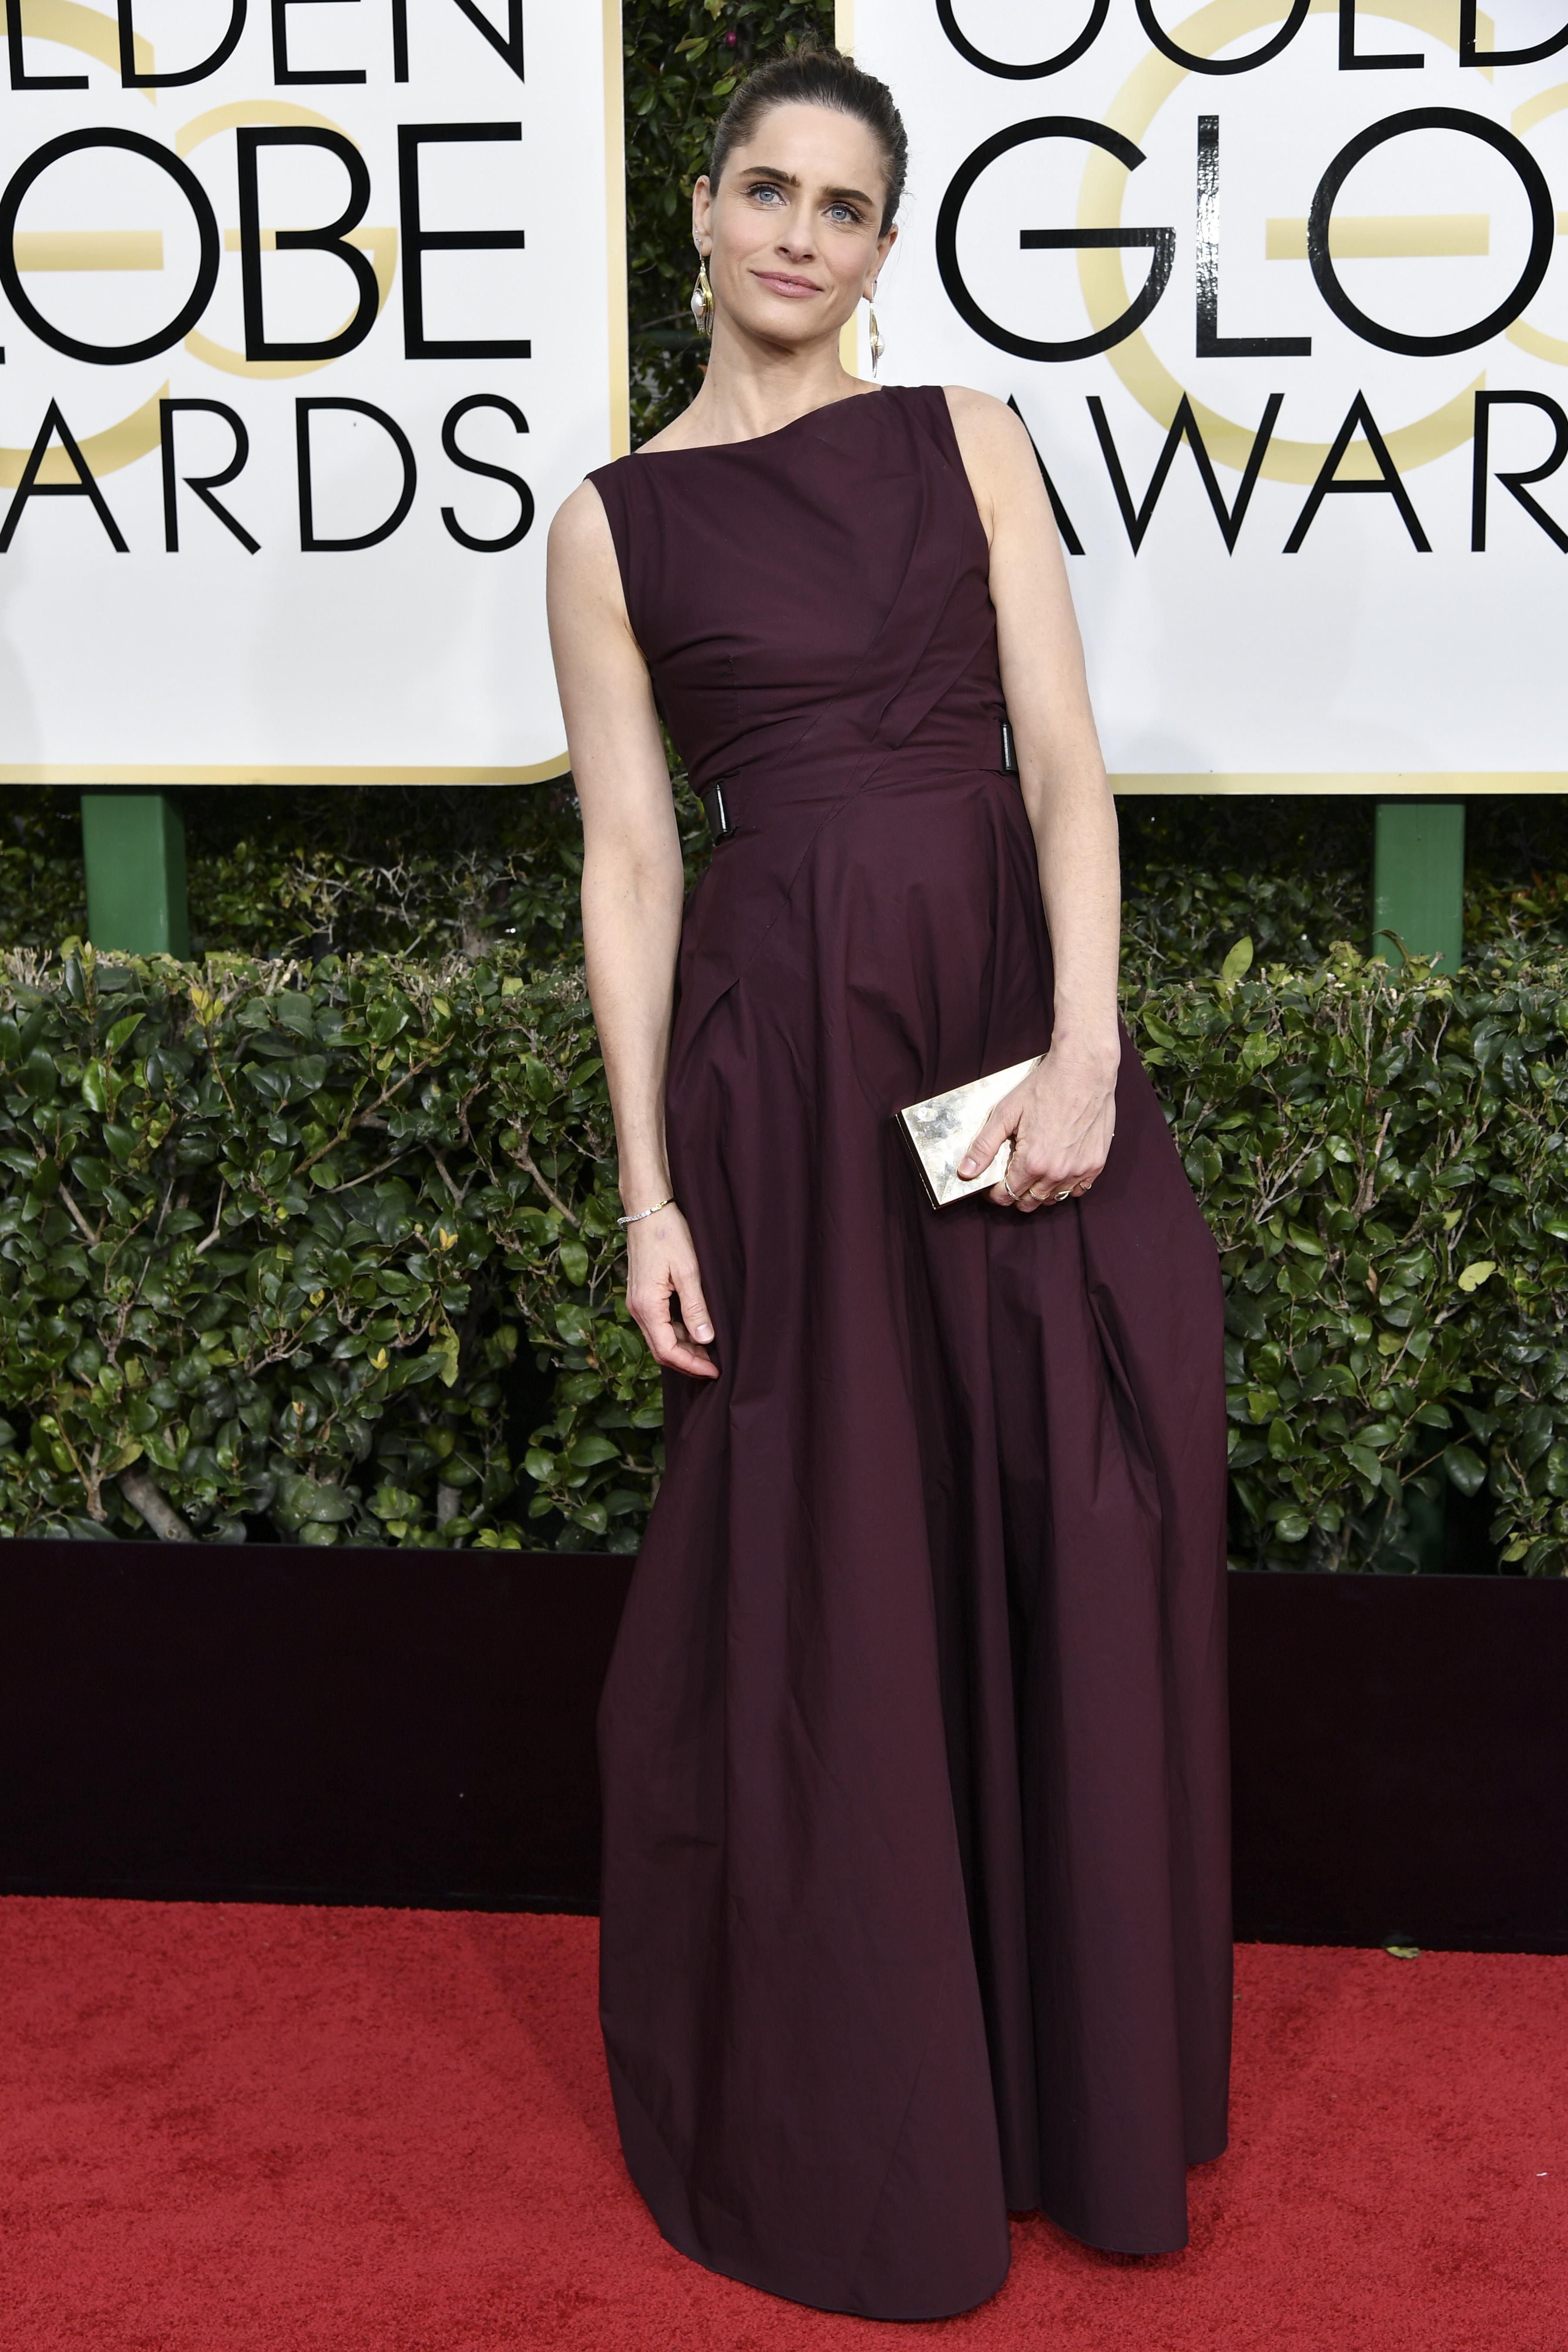 Amanda Peet, Golden Globes. Mandatory Credit: Photo by Rob Latour/REX/Shutterstock